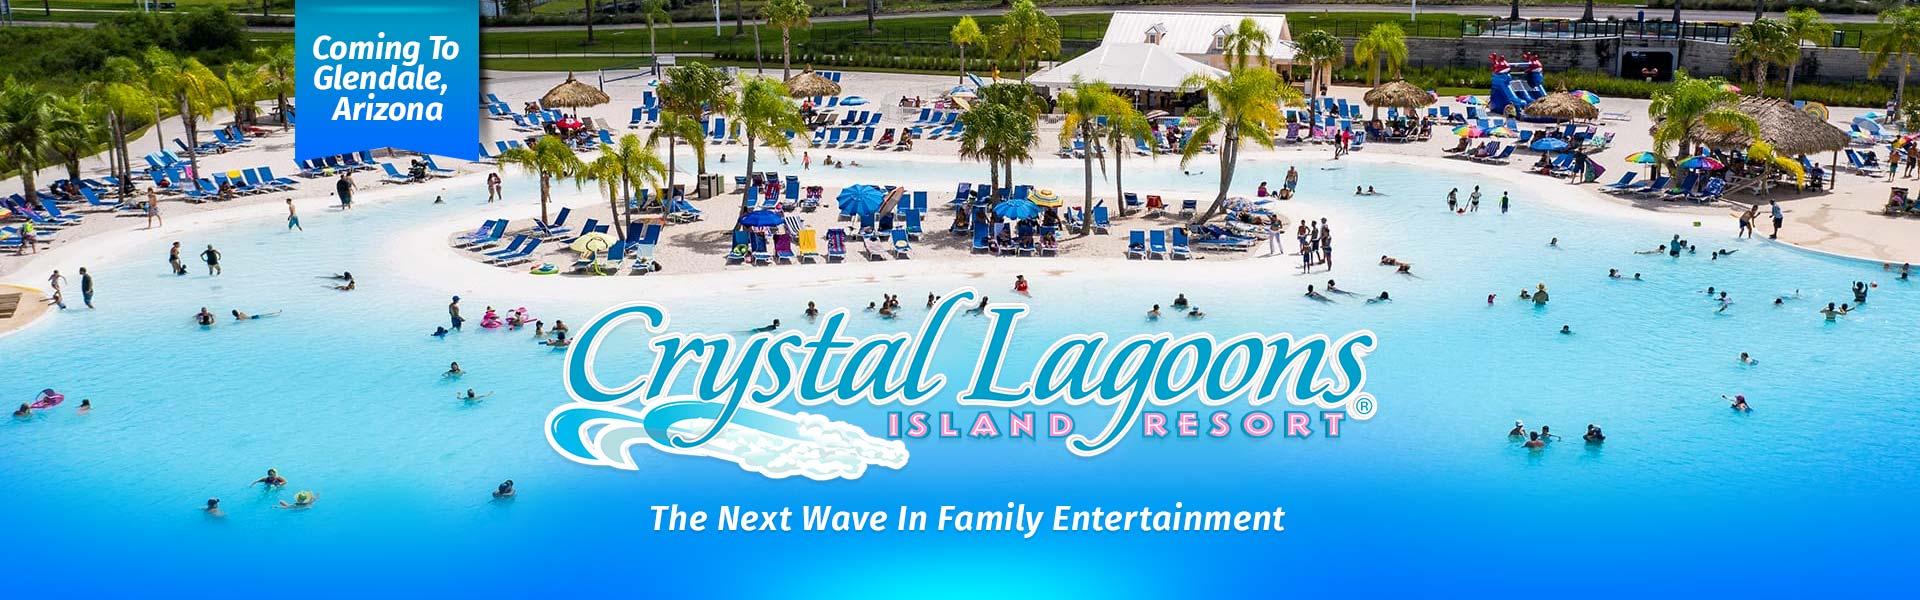 crystal lagoons island resort glendale arizona